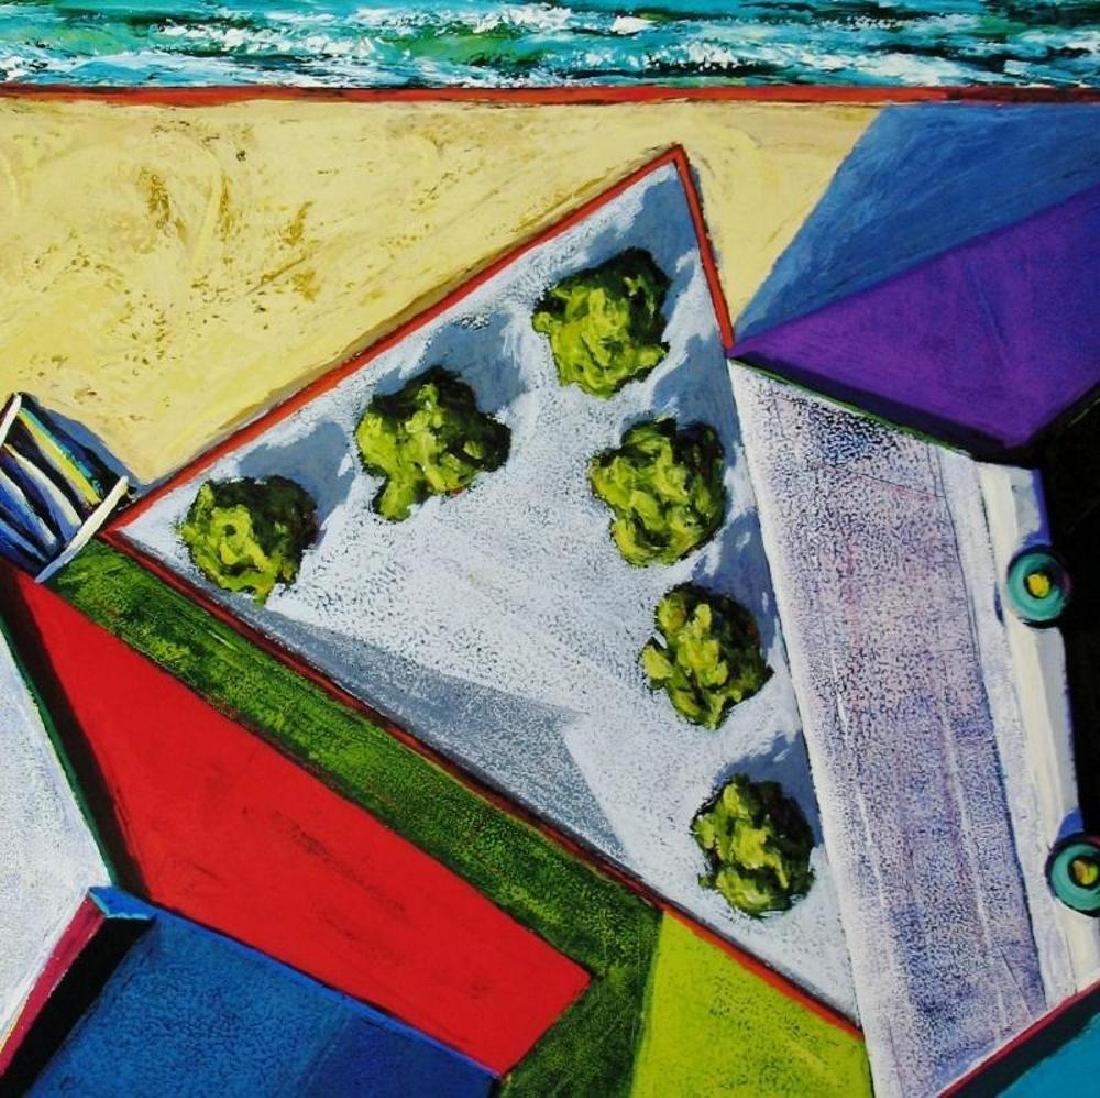 Abstract Modern Art Print Architectural Birds Eye View - 2